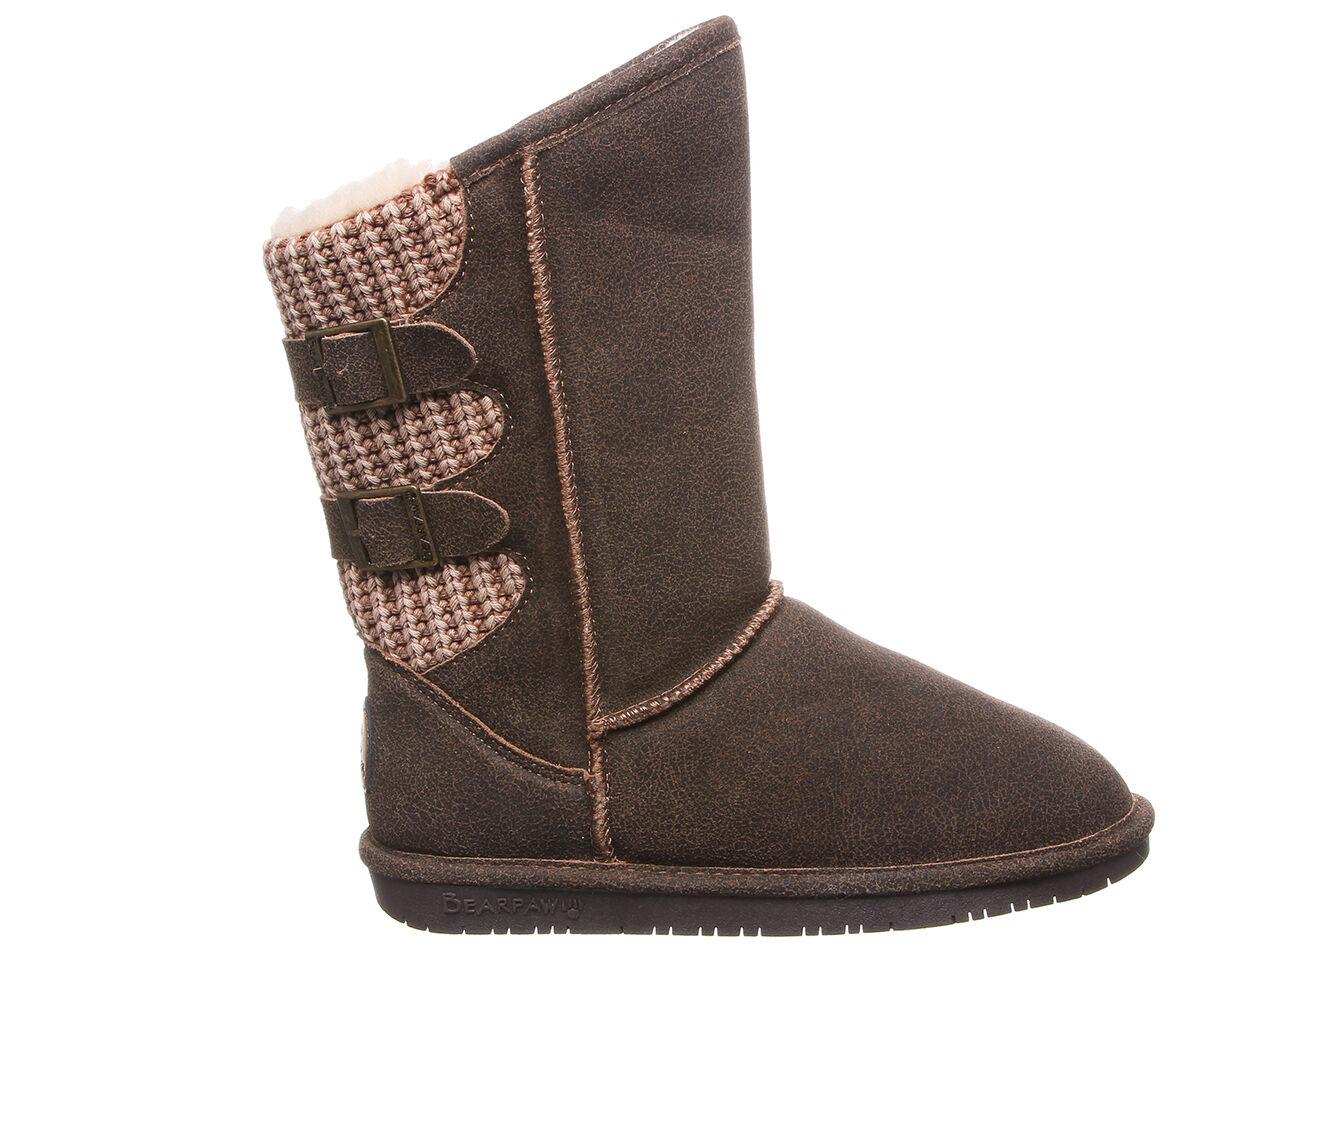 Women's Bearpaw Boshie Wide Boots Chestnut